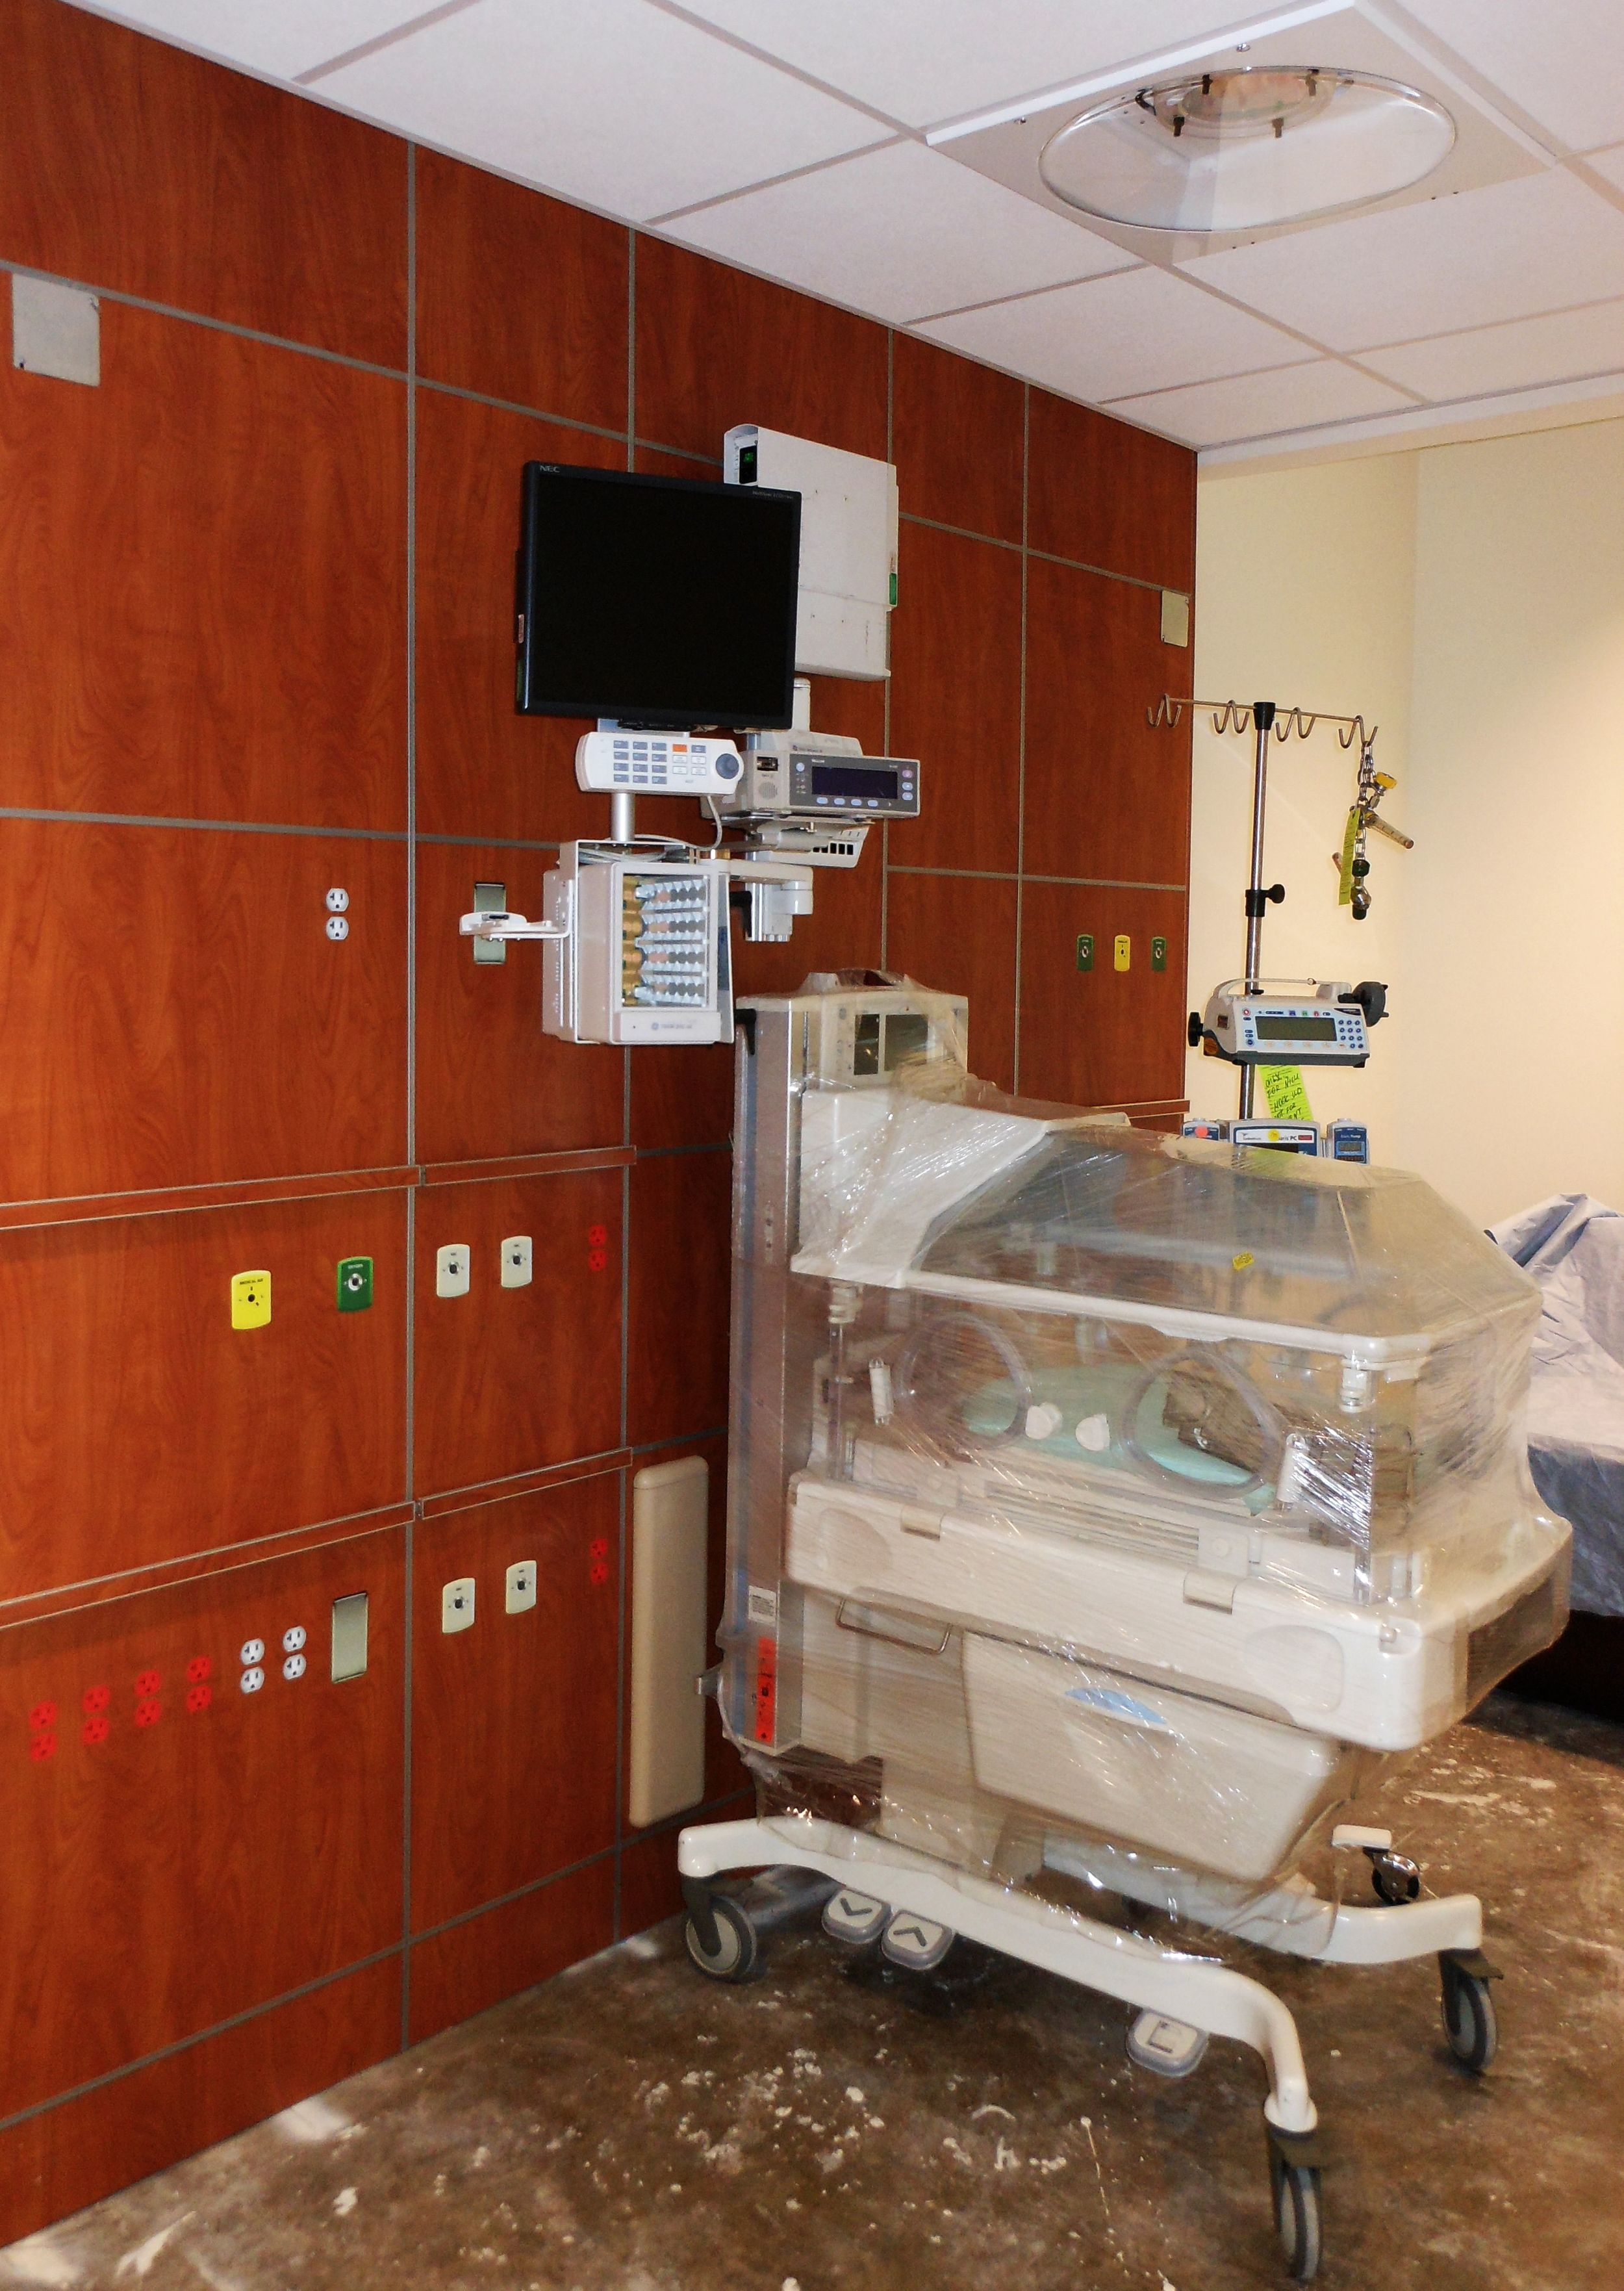 Neonatal Intensive Care Unit Mock-Up